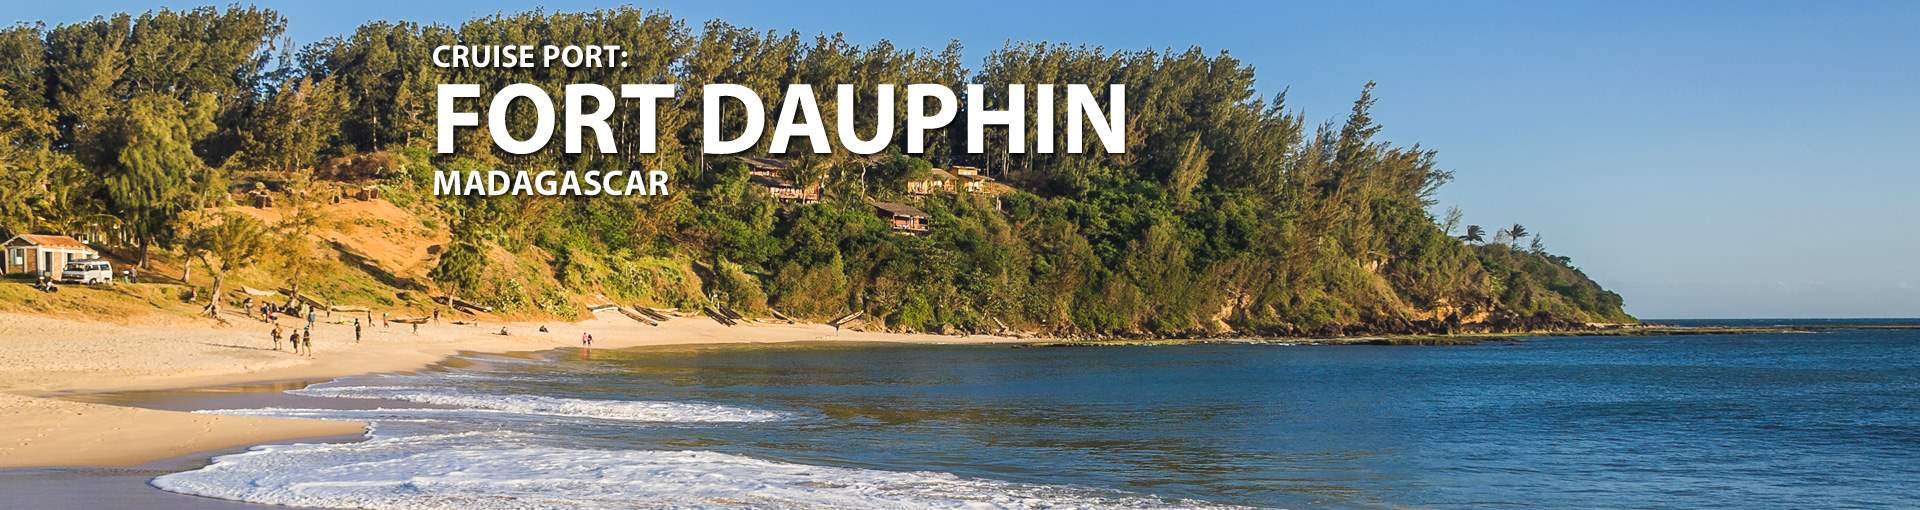 Cruises to Fort Dauphin, Madagascar